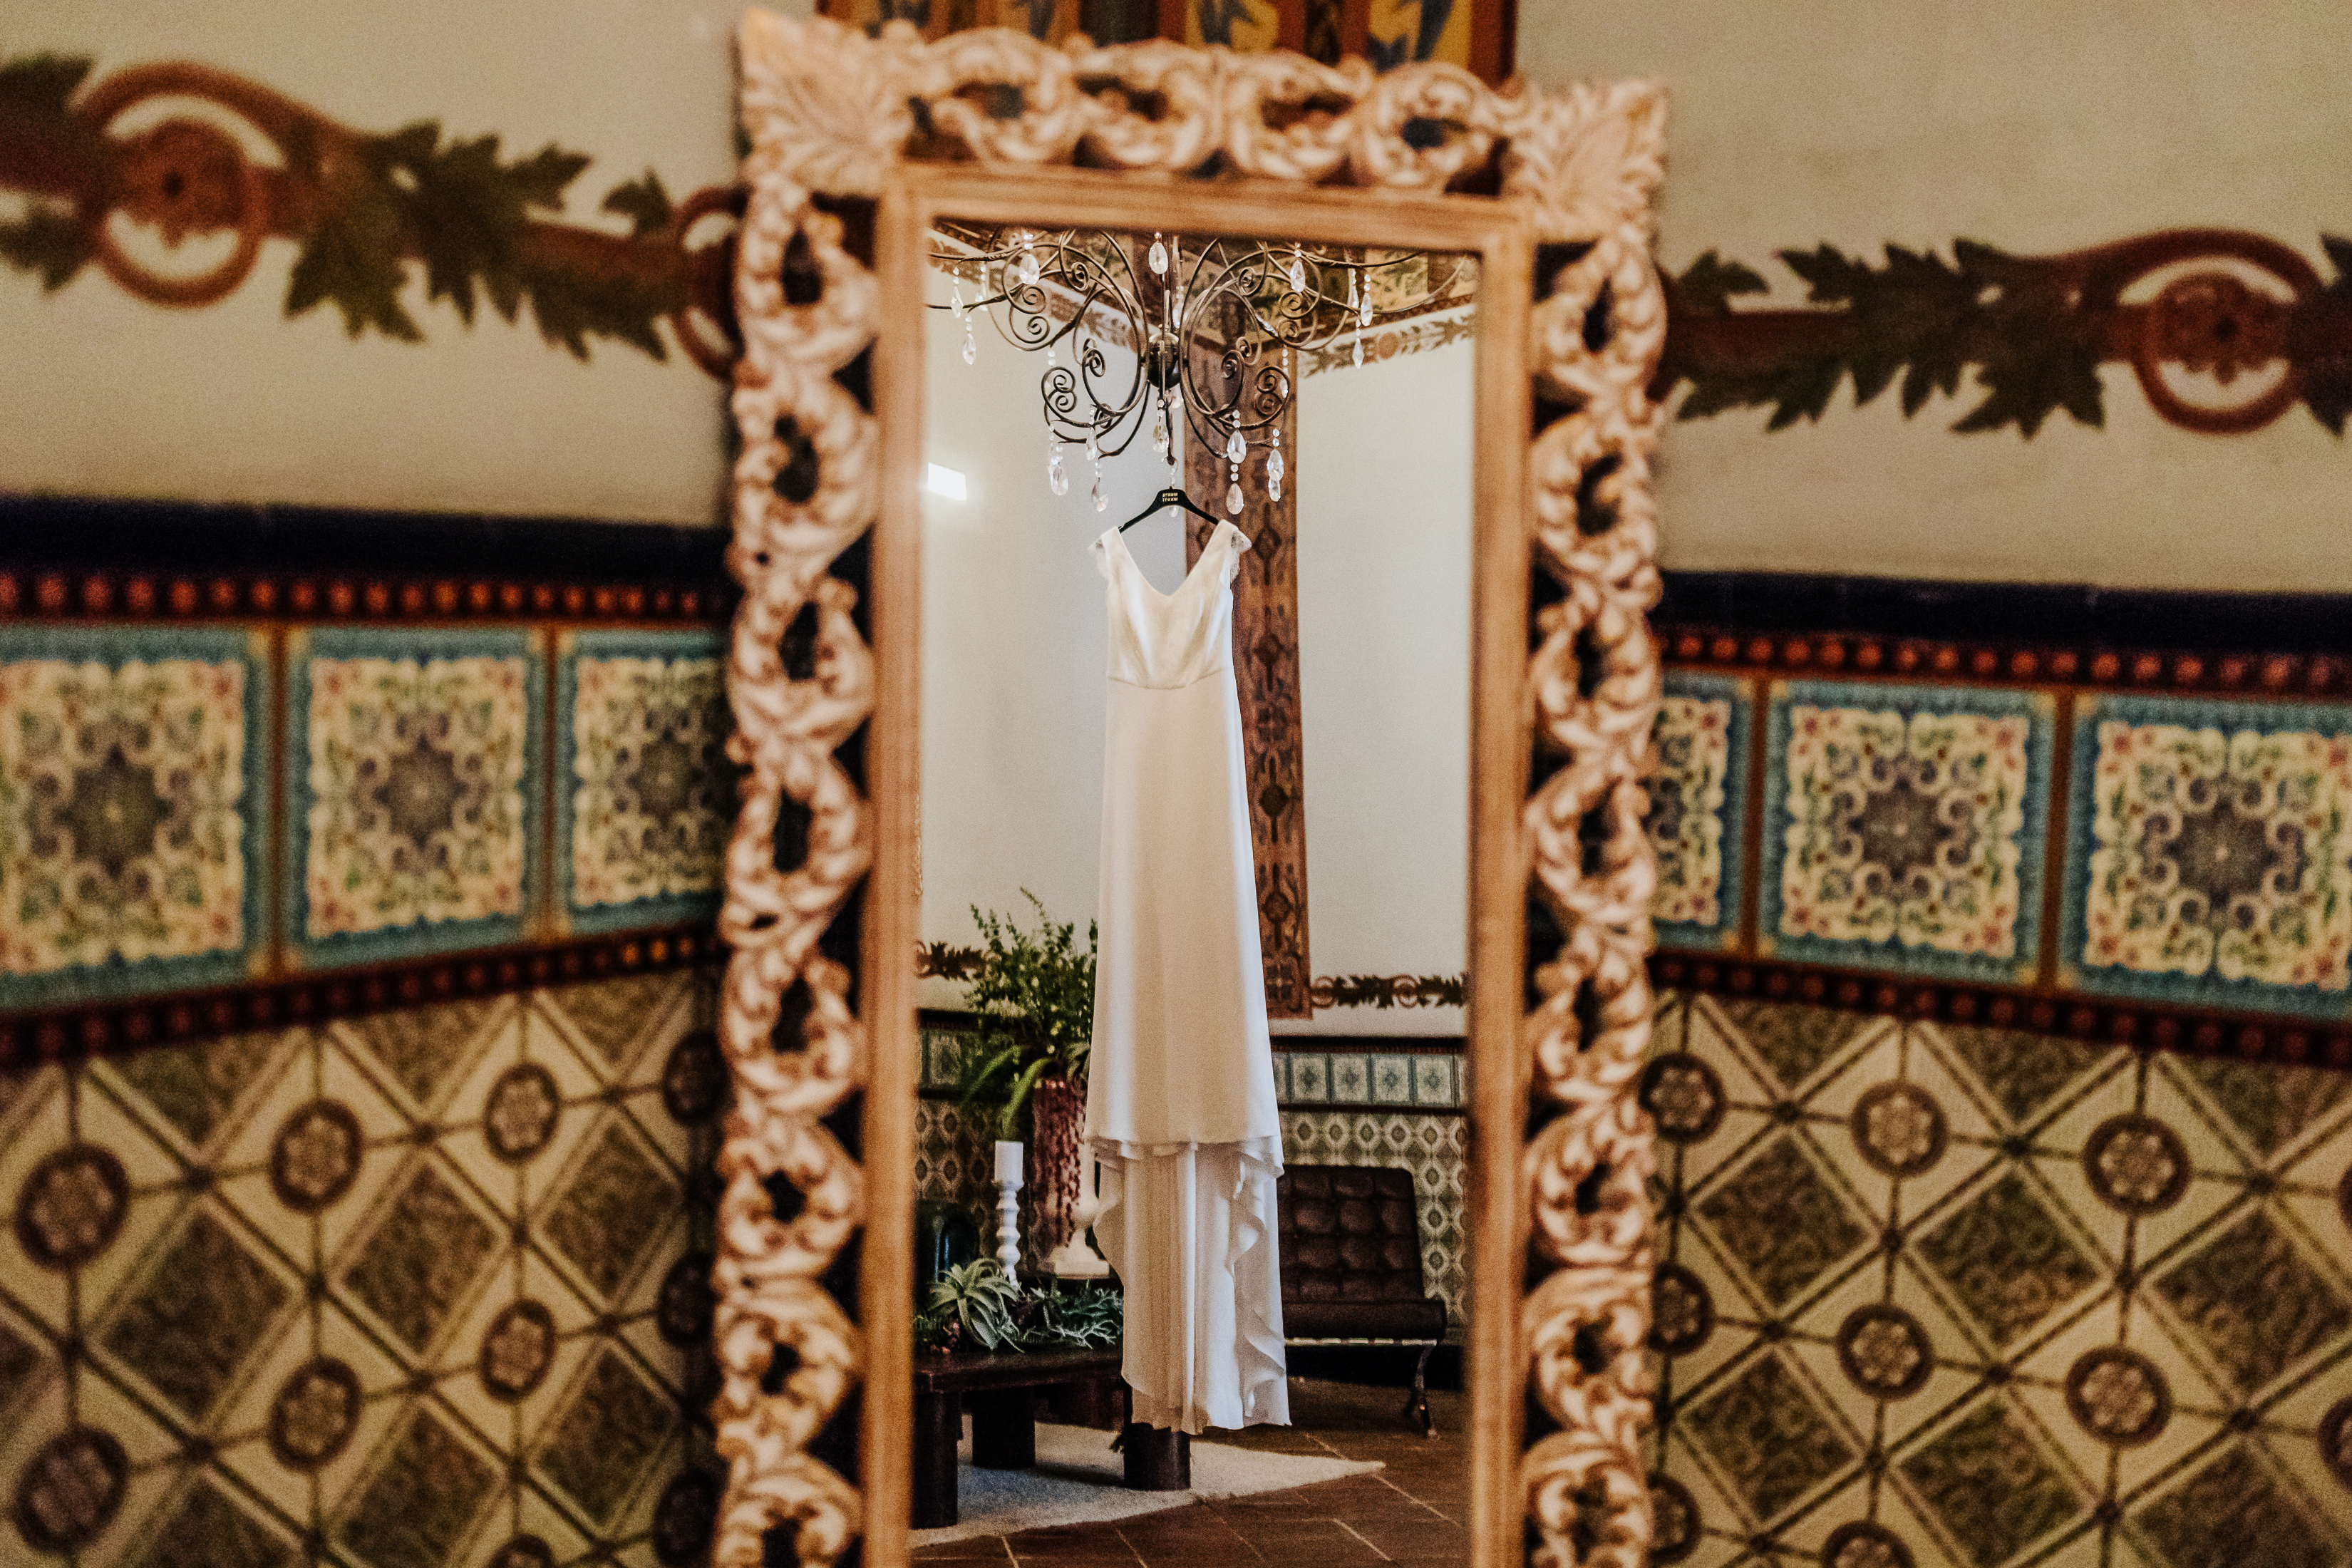 Fotógrafo de boda Sant Cugat :: Fotógrafo de boda Can Magí :: Fotógrafo de boda Barcelona :: Boda sofisticada :: Boda con estilo :: Barcelona wedding photographer